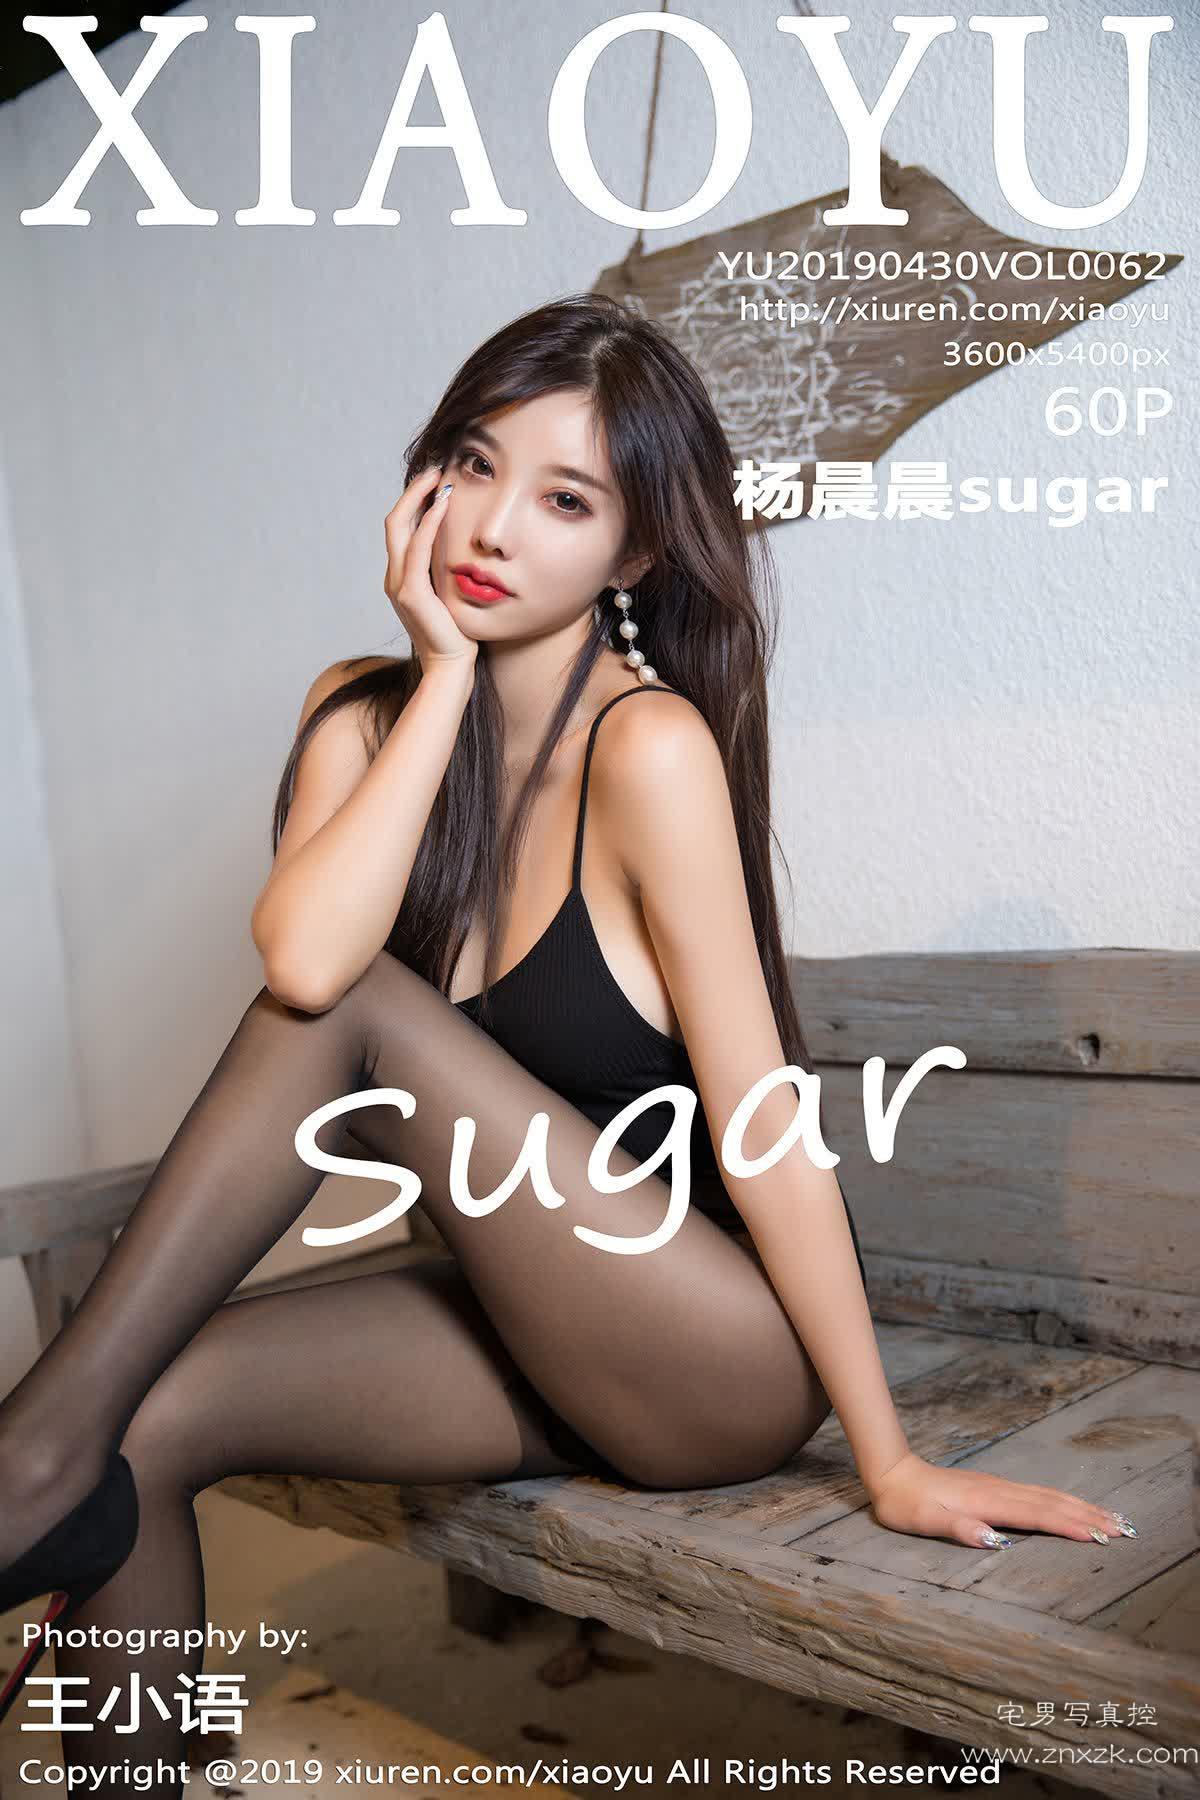 XIAOYU语画界 Vol.062 杨晨晨sugar